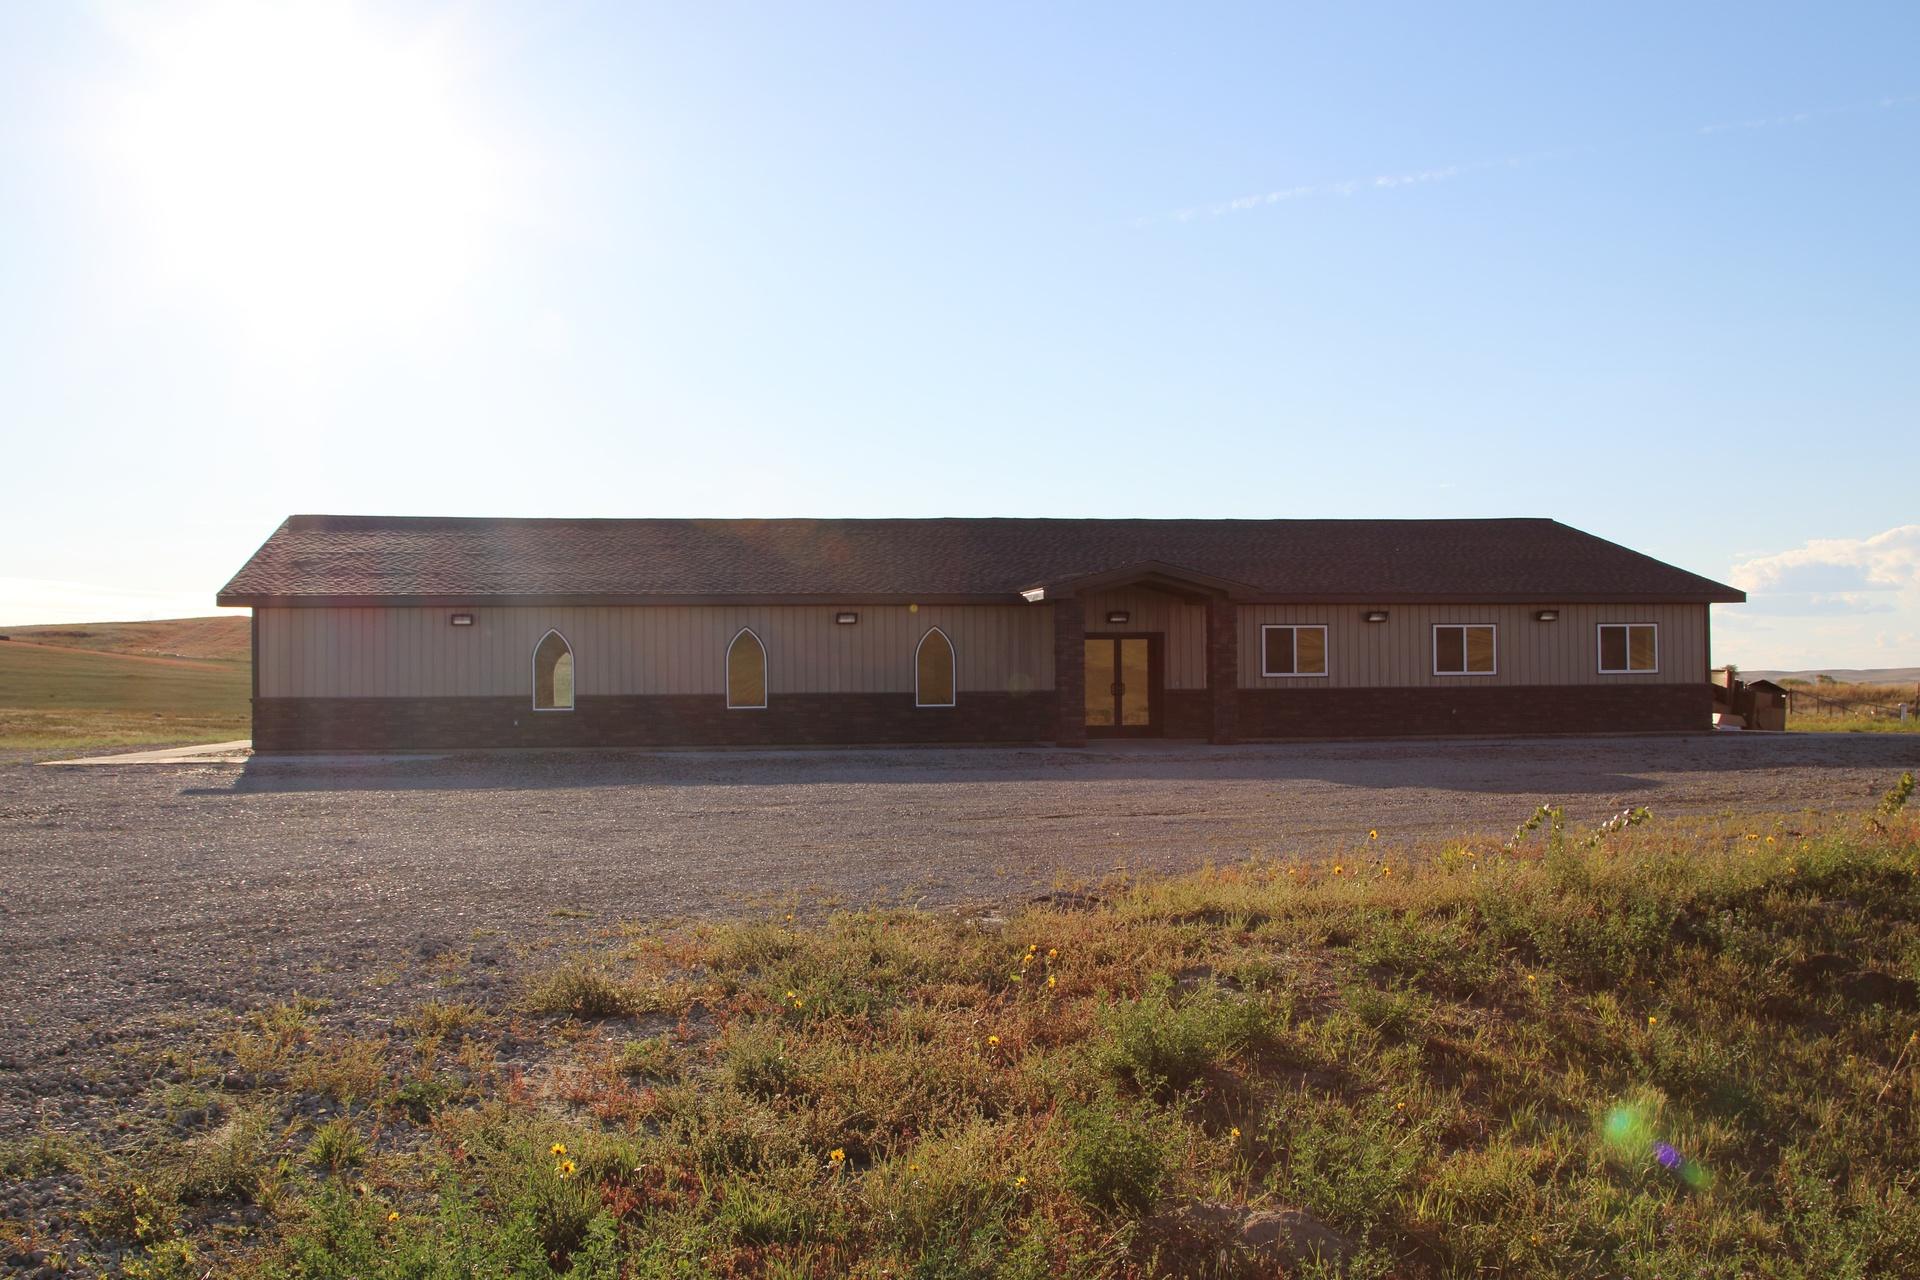 Living Faith Church, 805 14th St SW, Watford City, ND, 58854